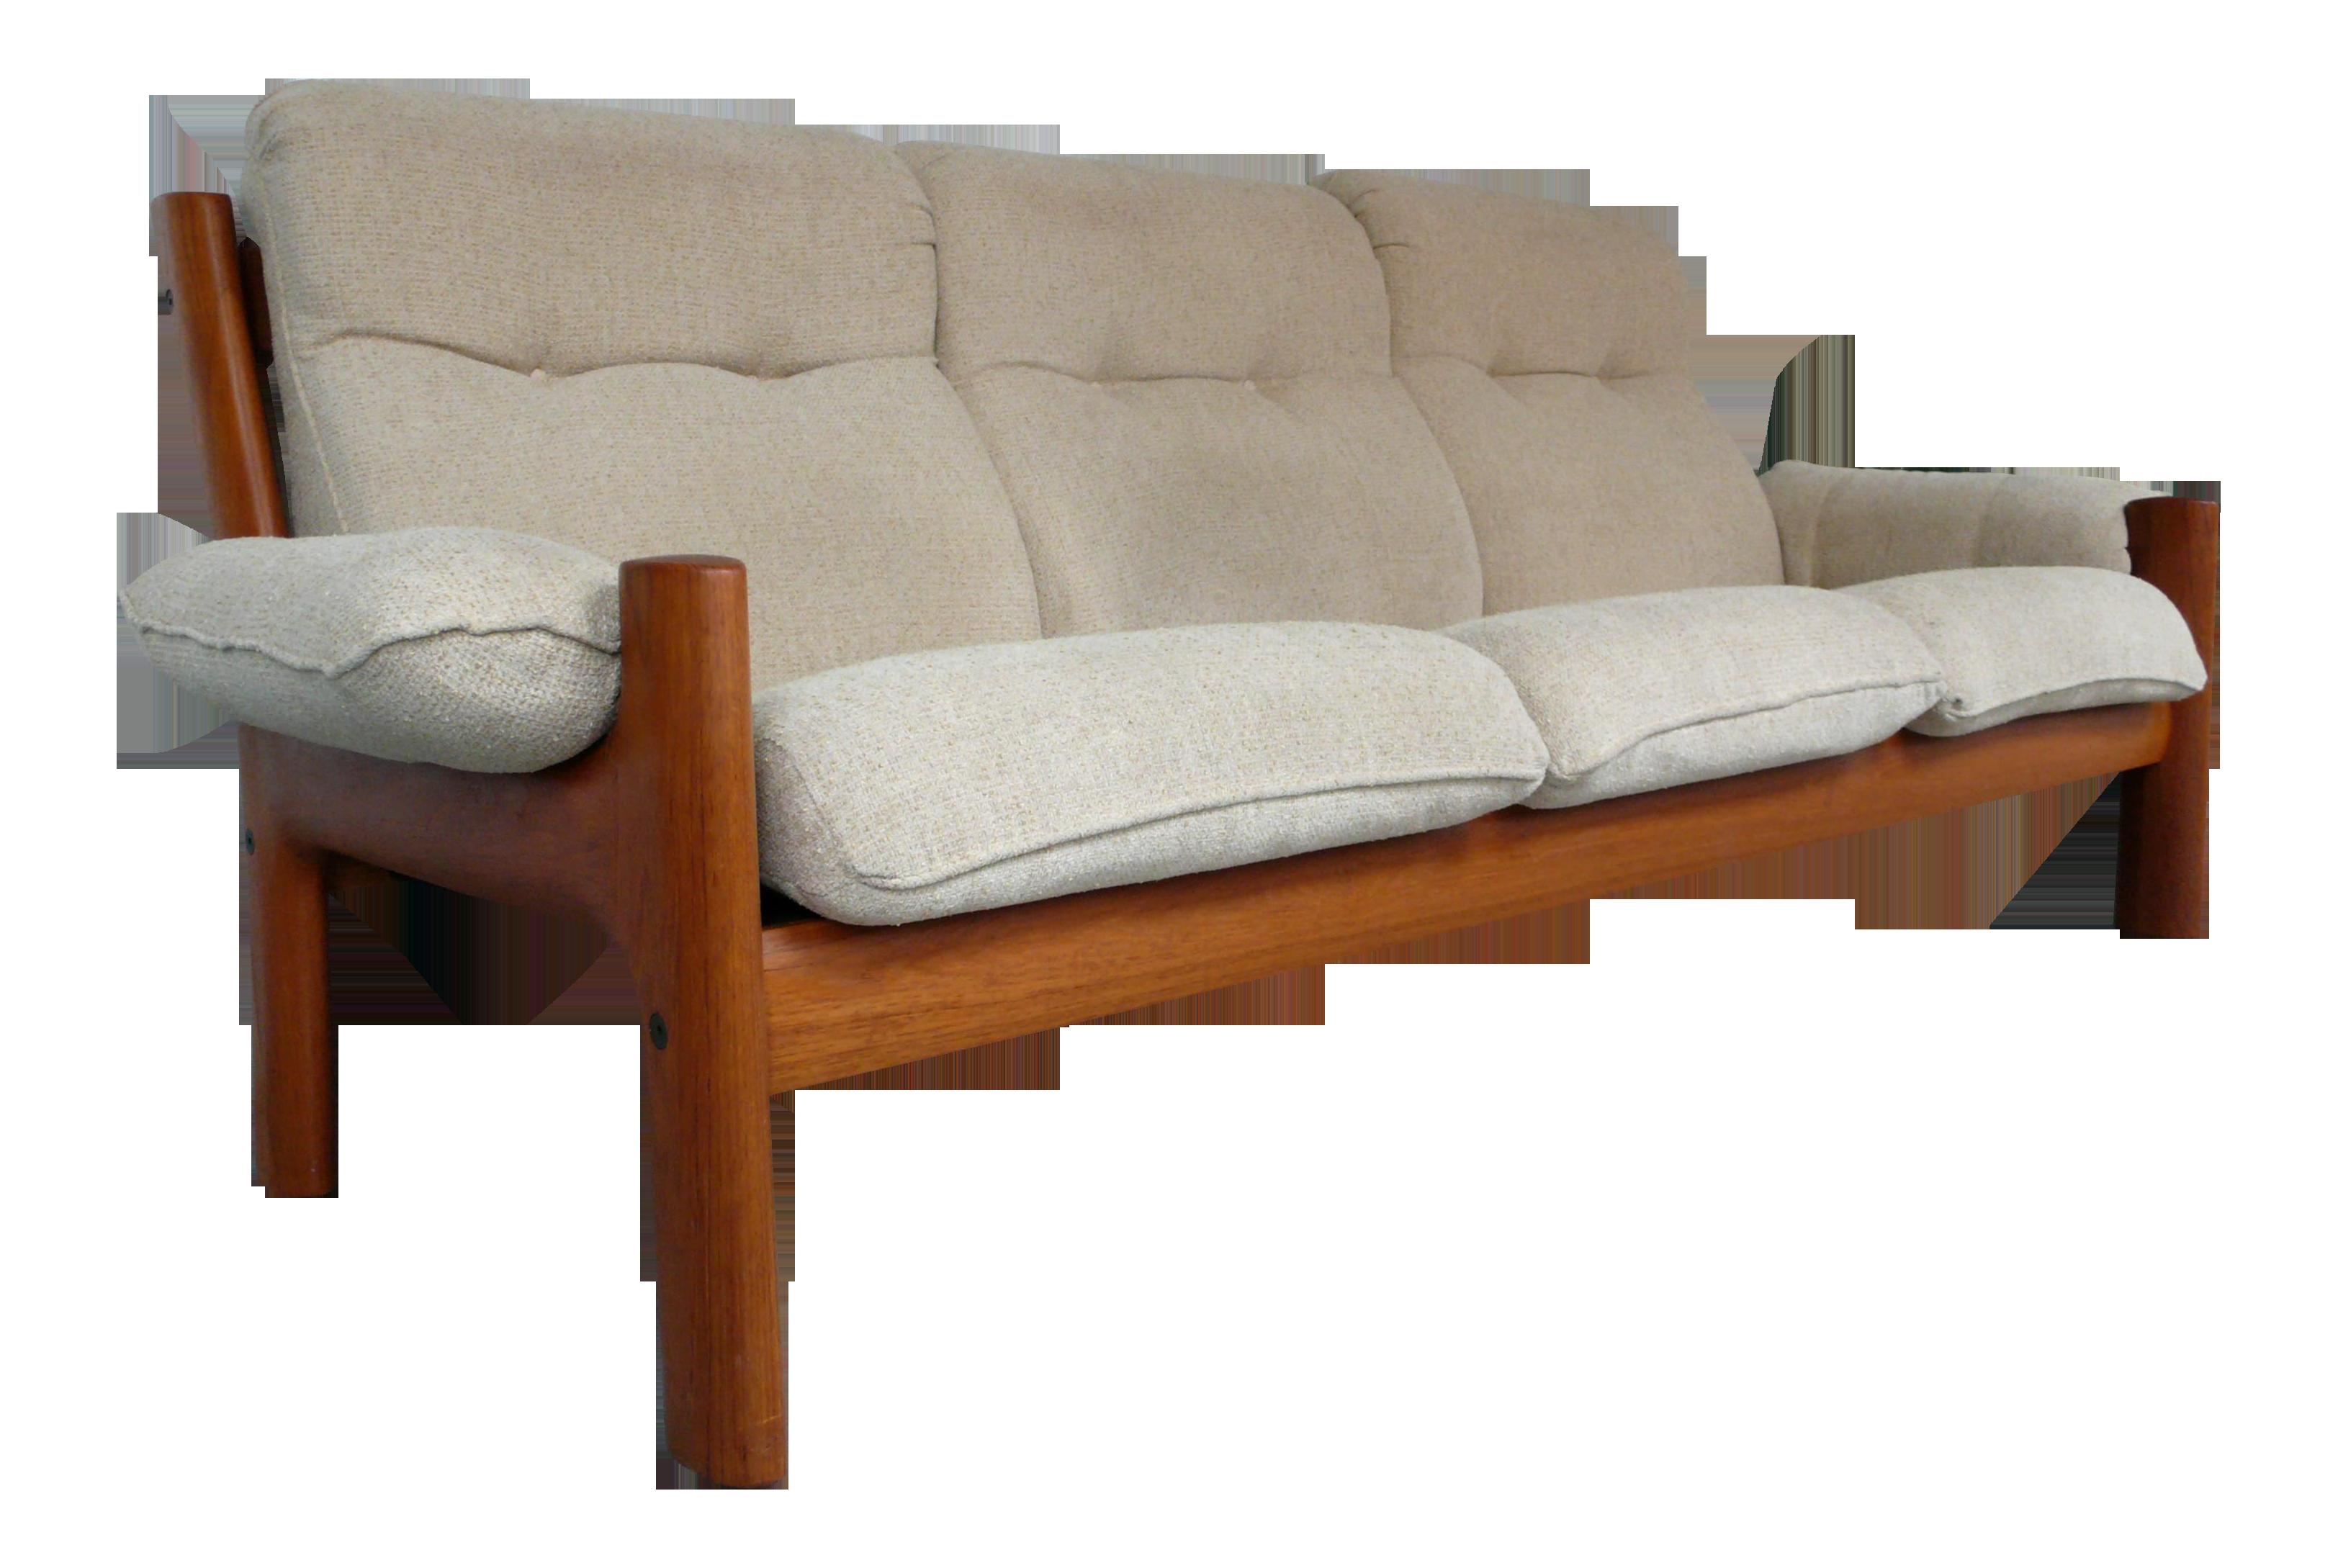 Amazing Norwegian Teak Sofa By Ekornes   Image 1 Of 9